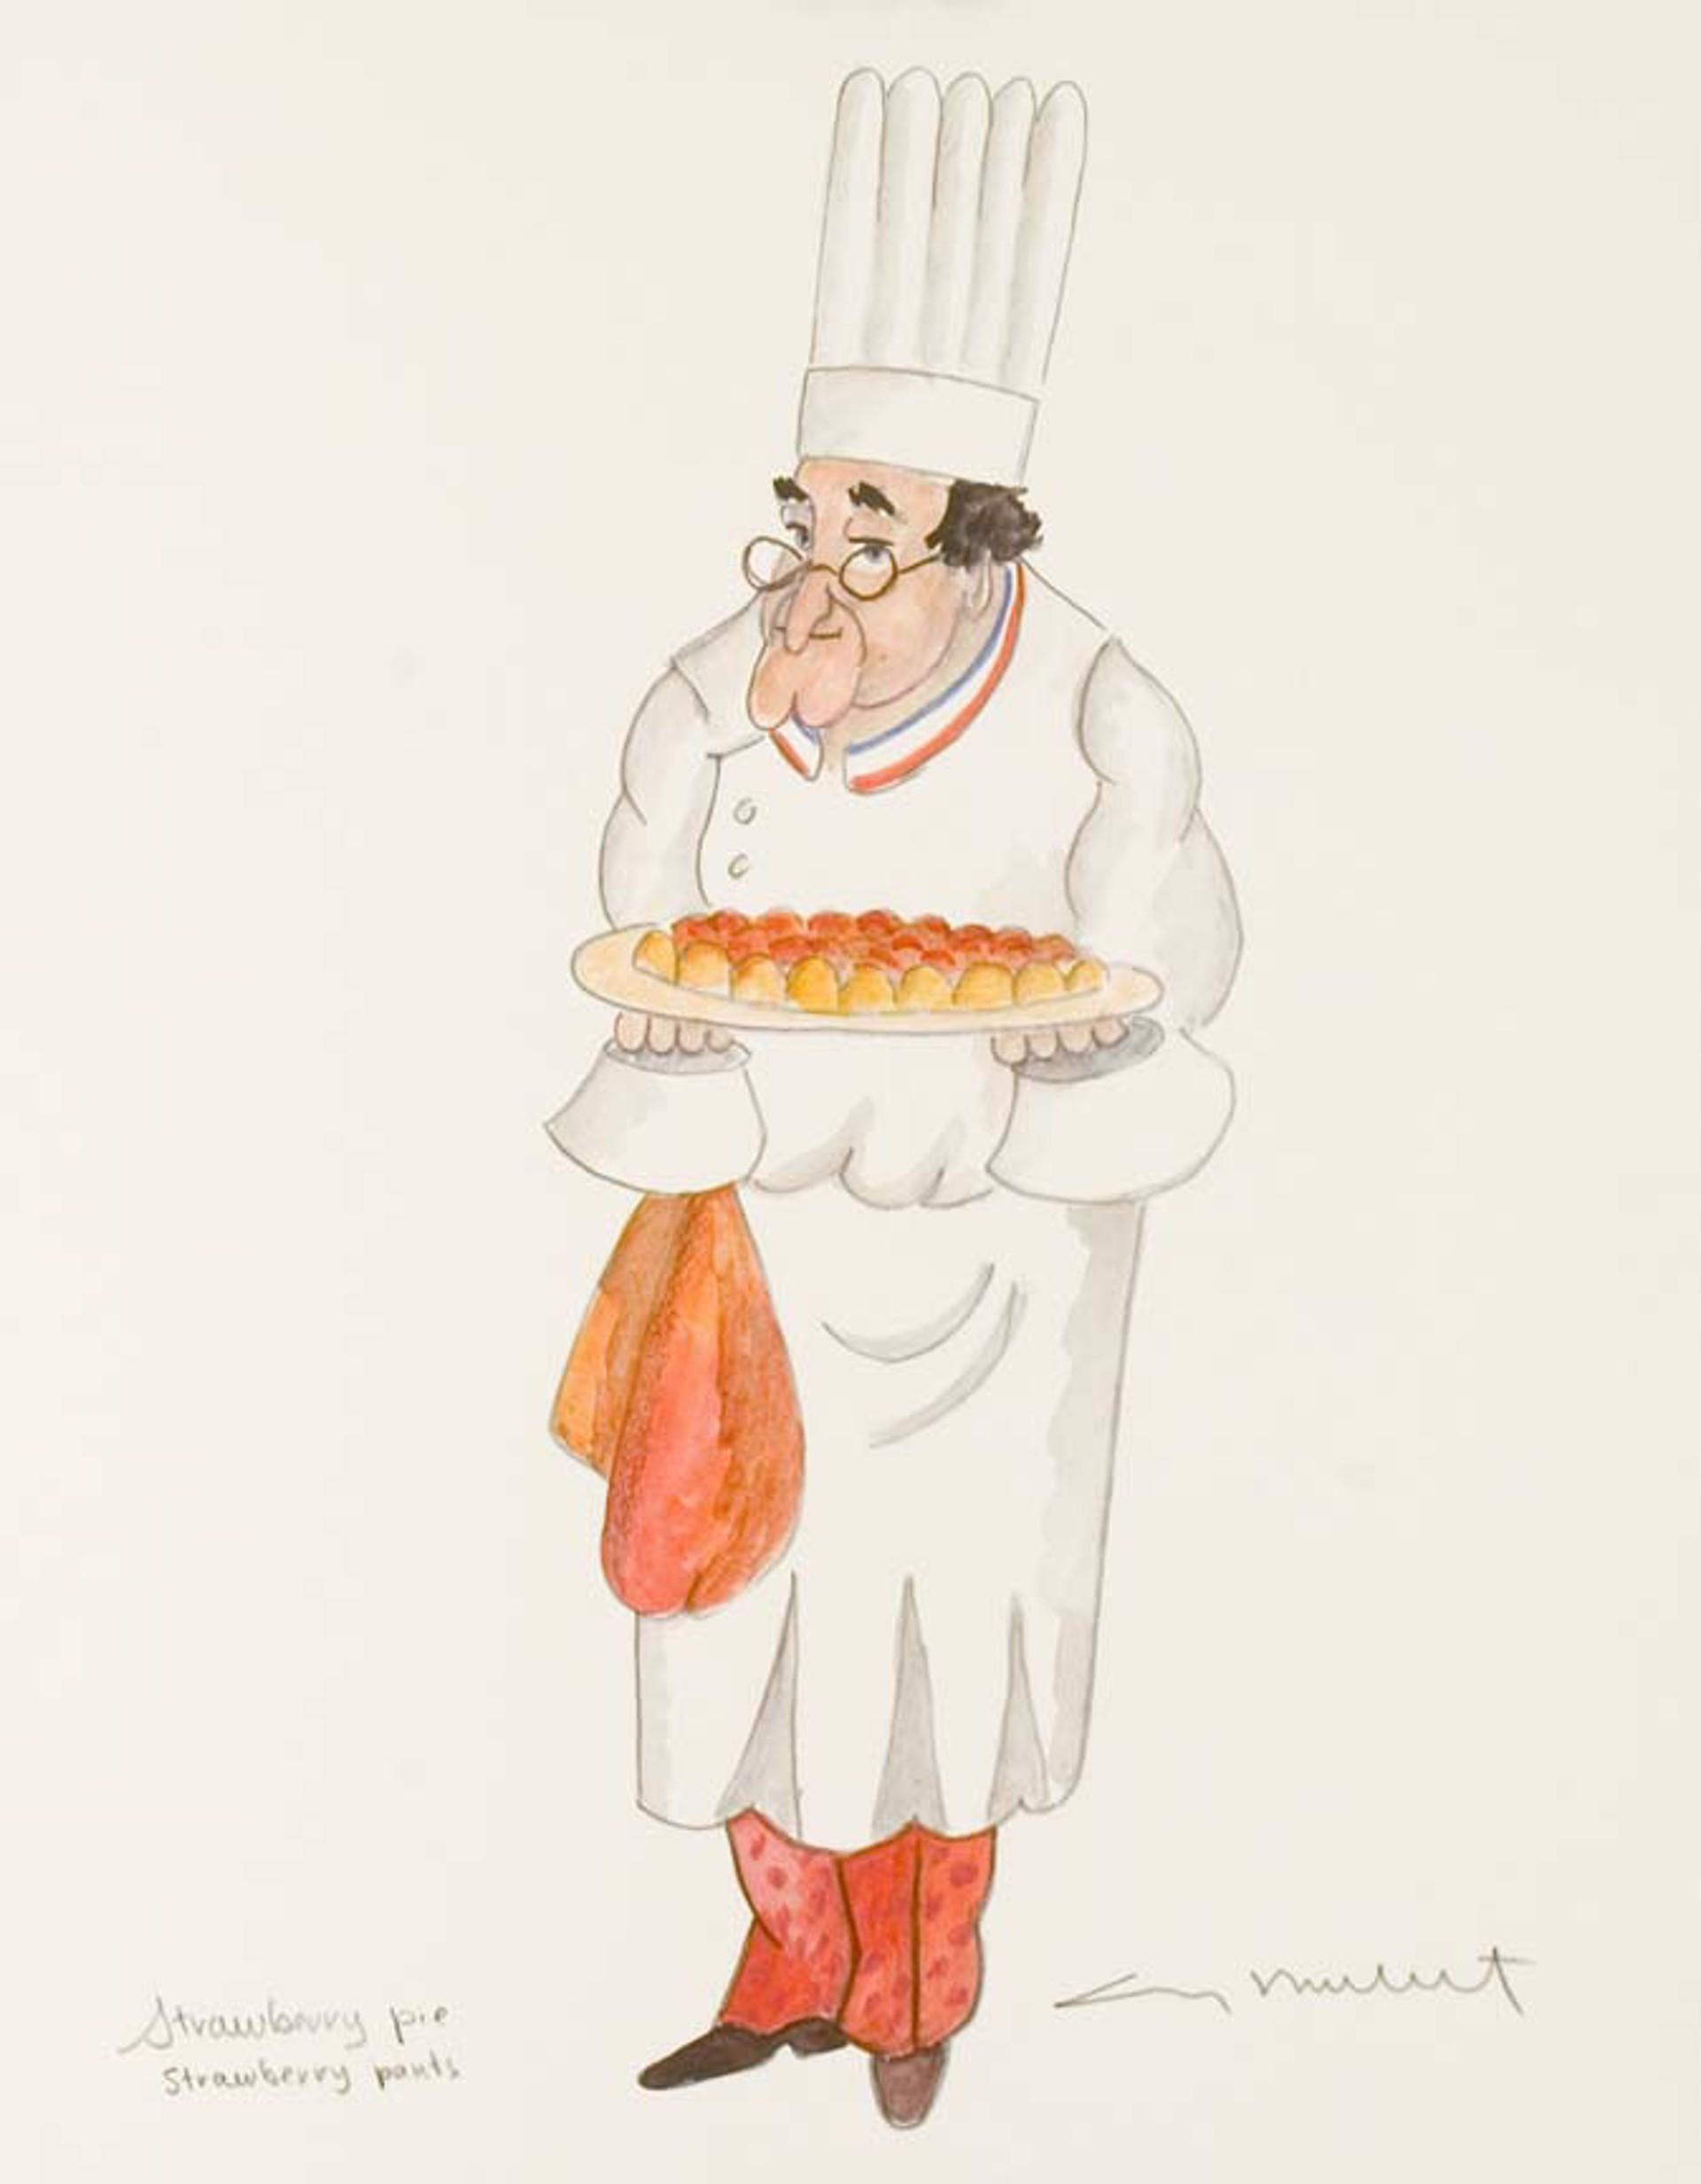 Strawberry Pie Strawberry Pants by Guy Buffet